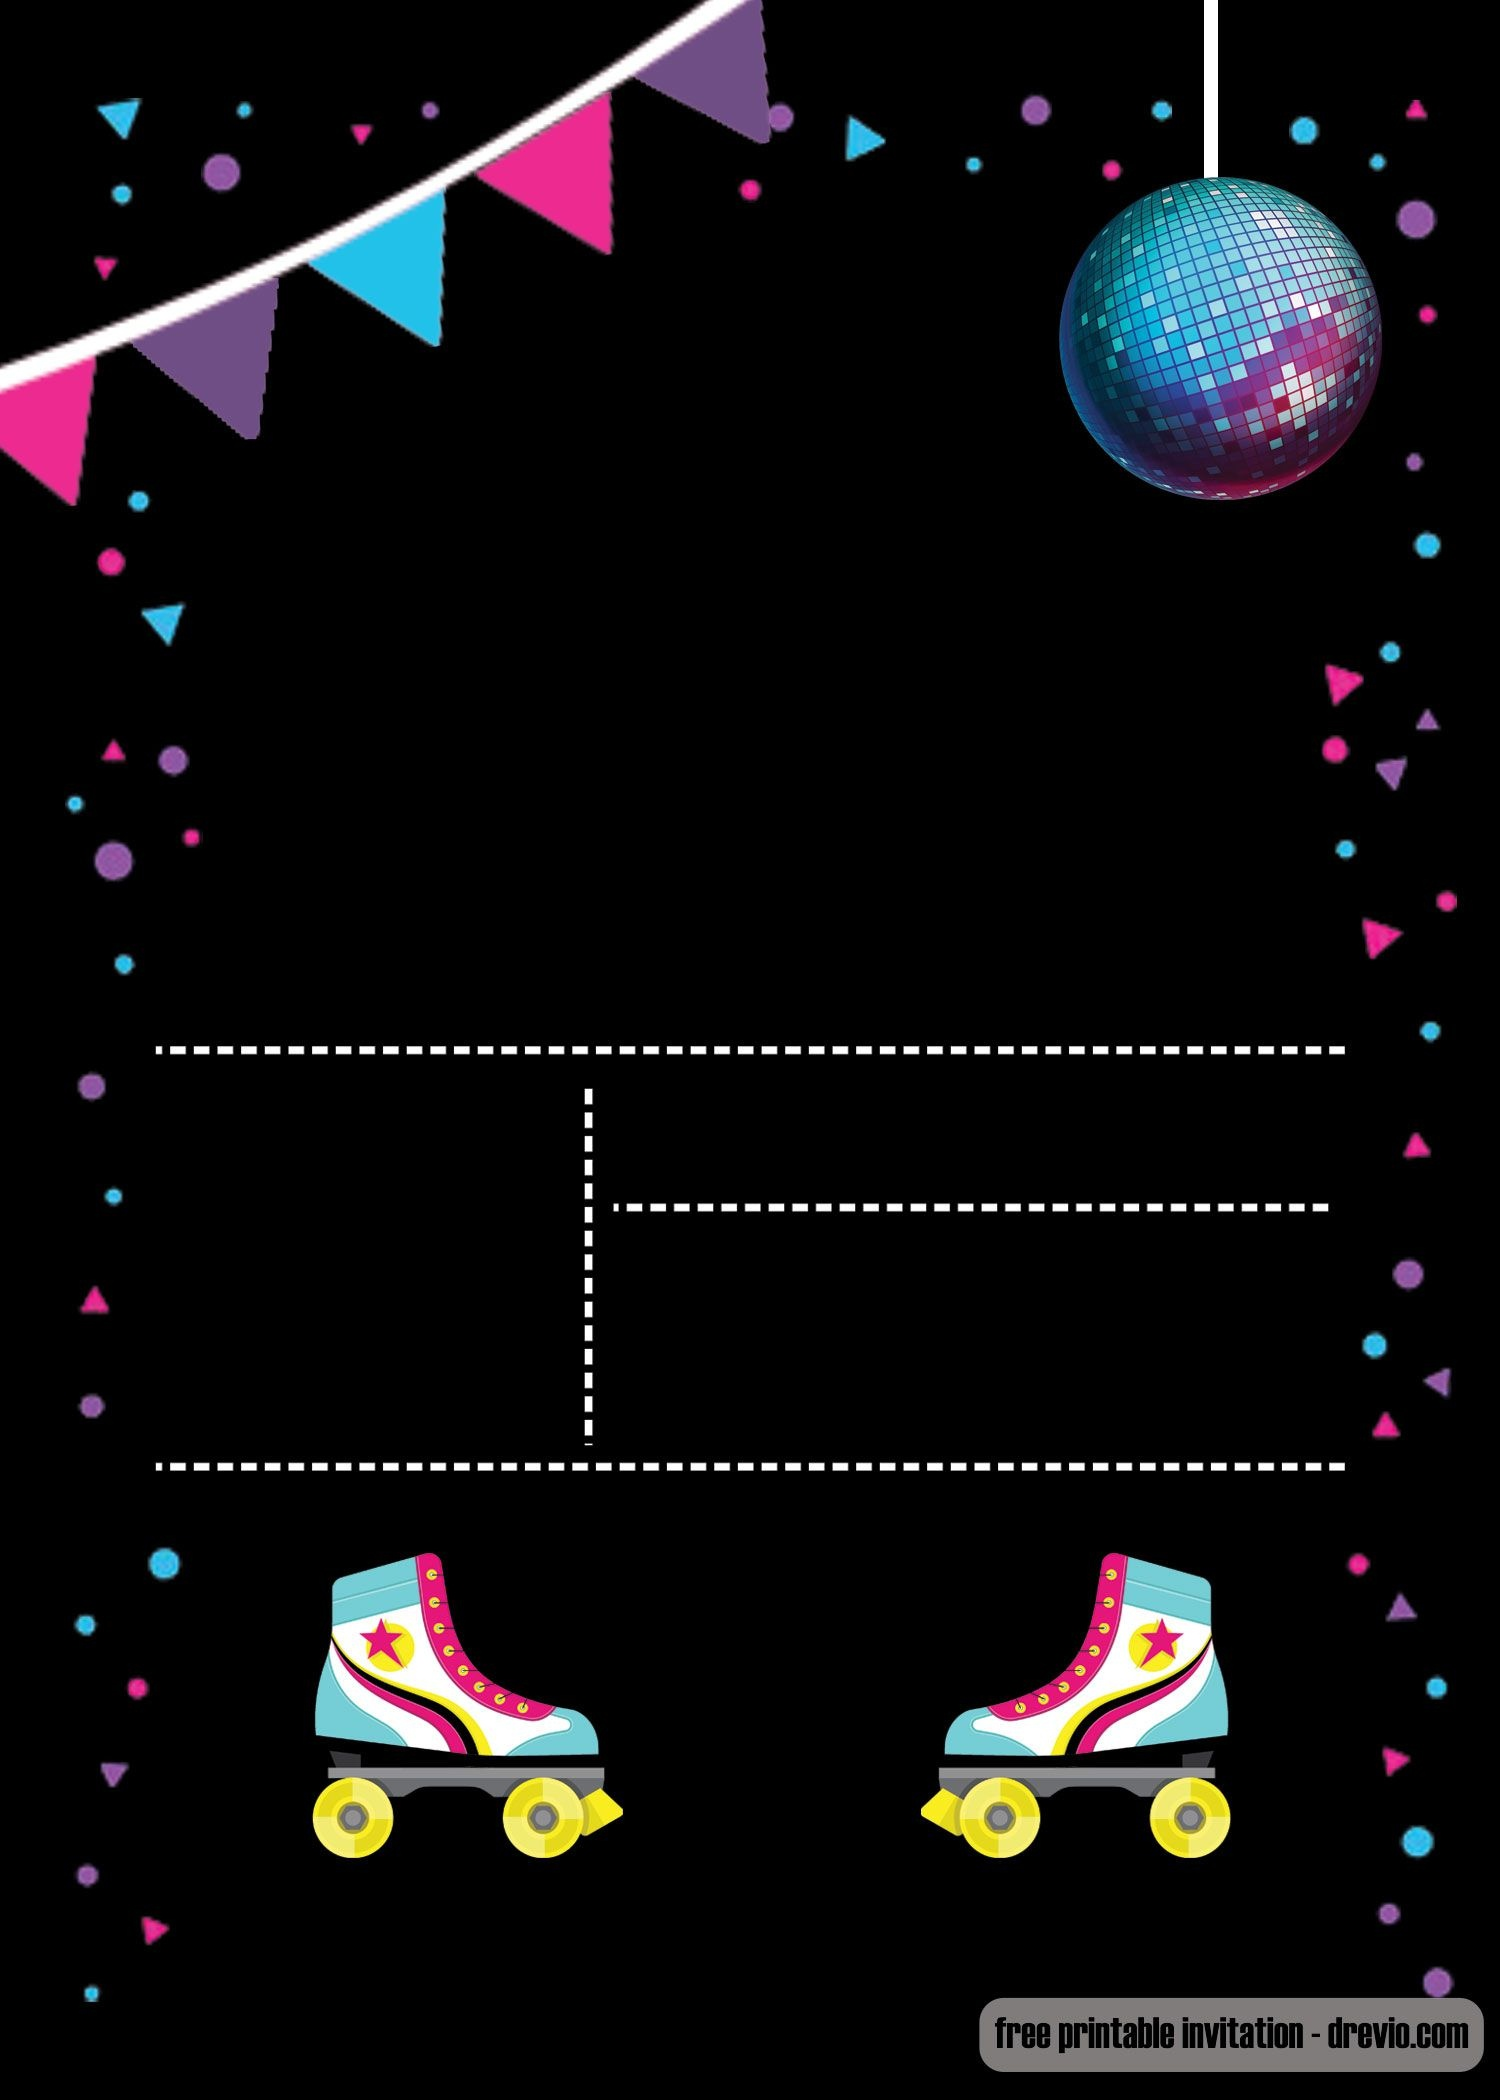 Free Printable Roller Skating Invitation   Invites   Birthday - Free Printable Skating Invitations